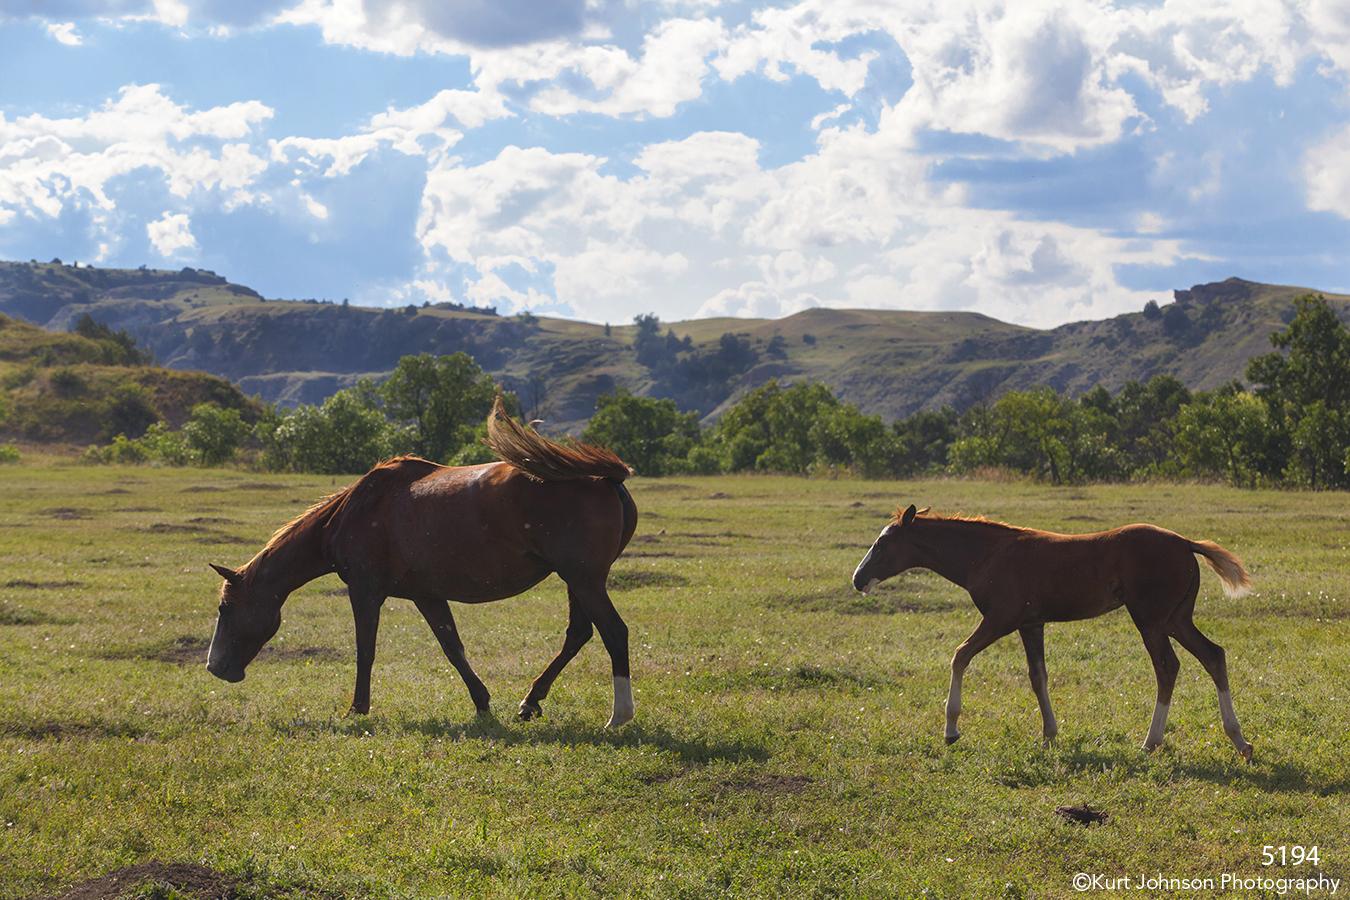 wildlife animals horses landscape